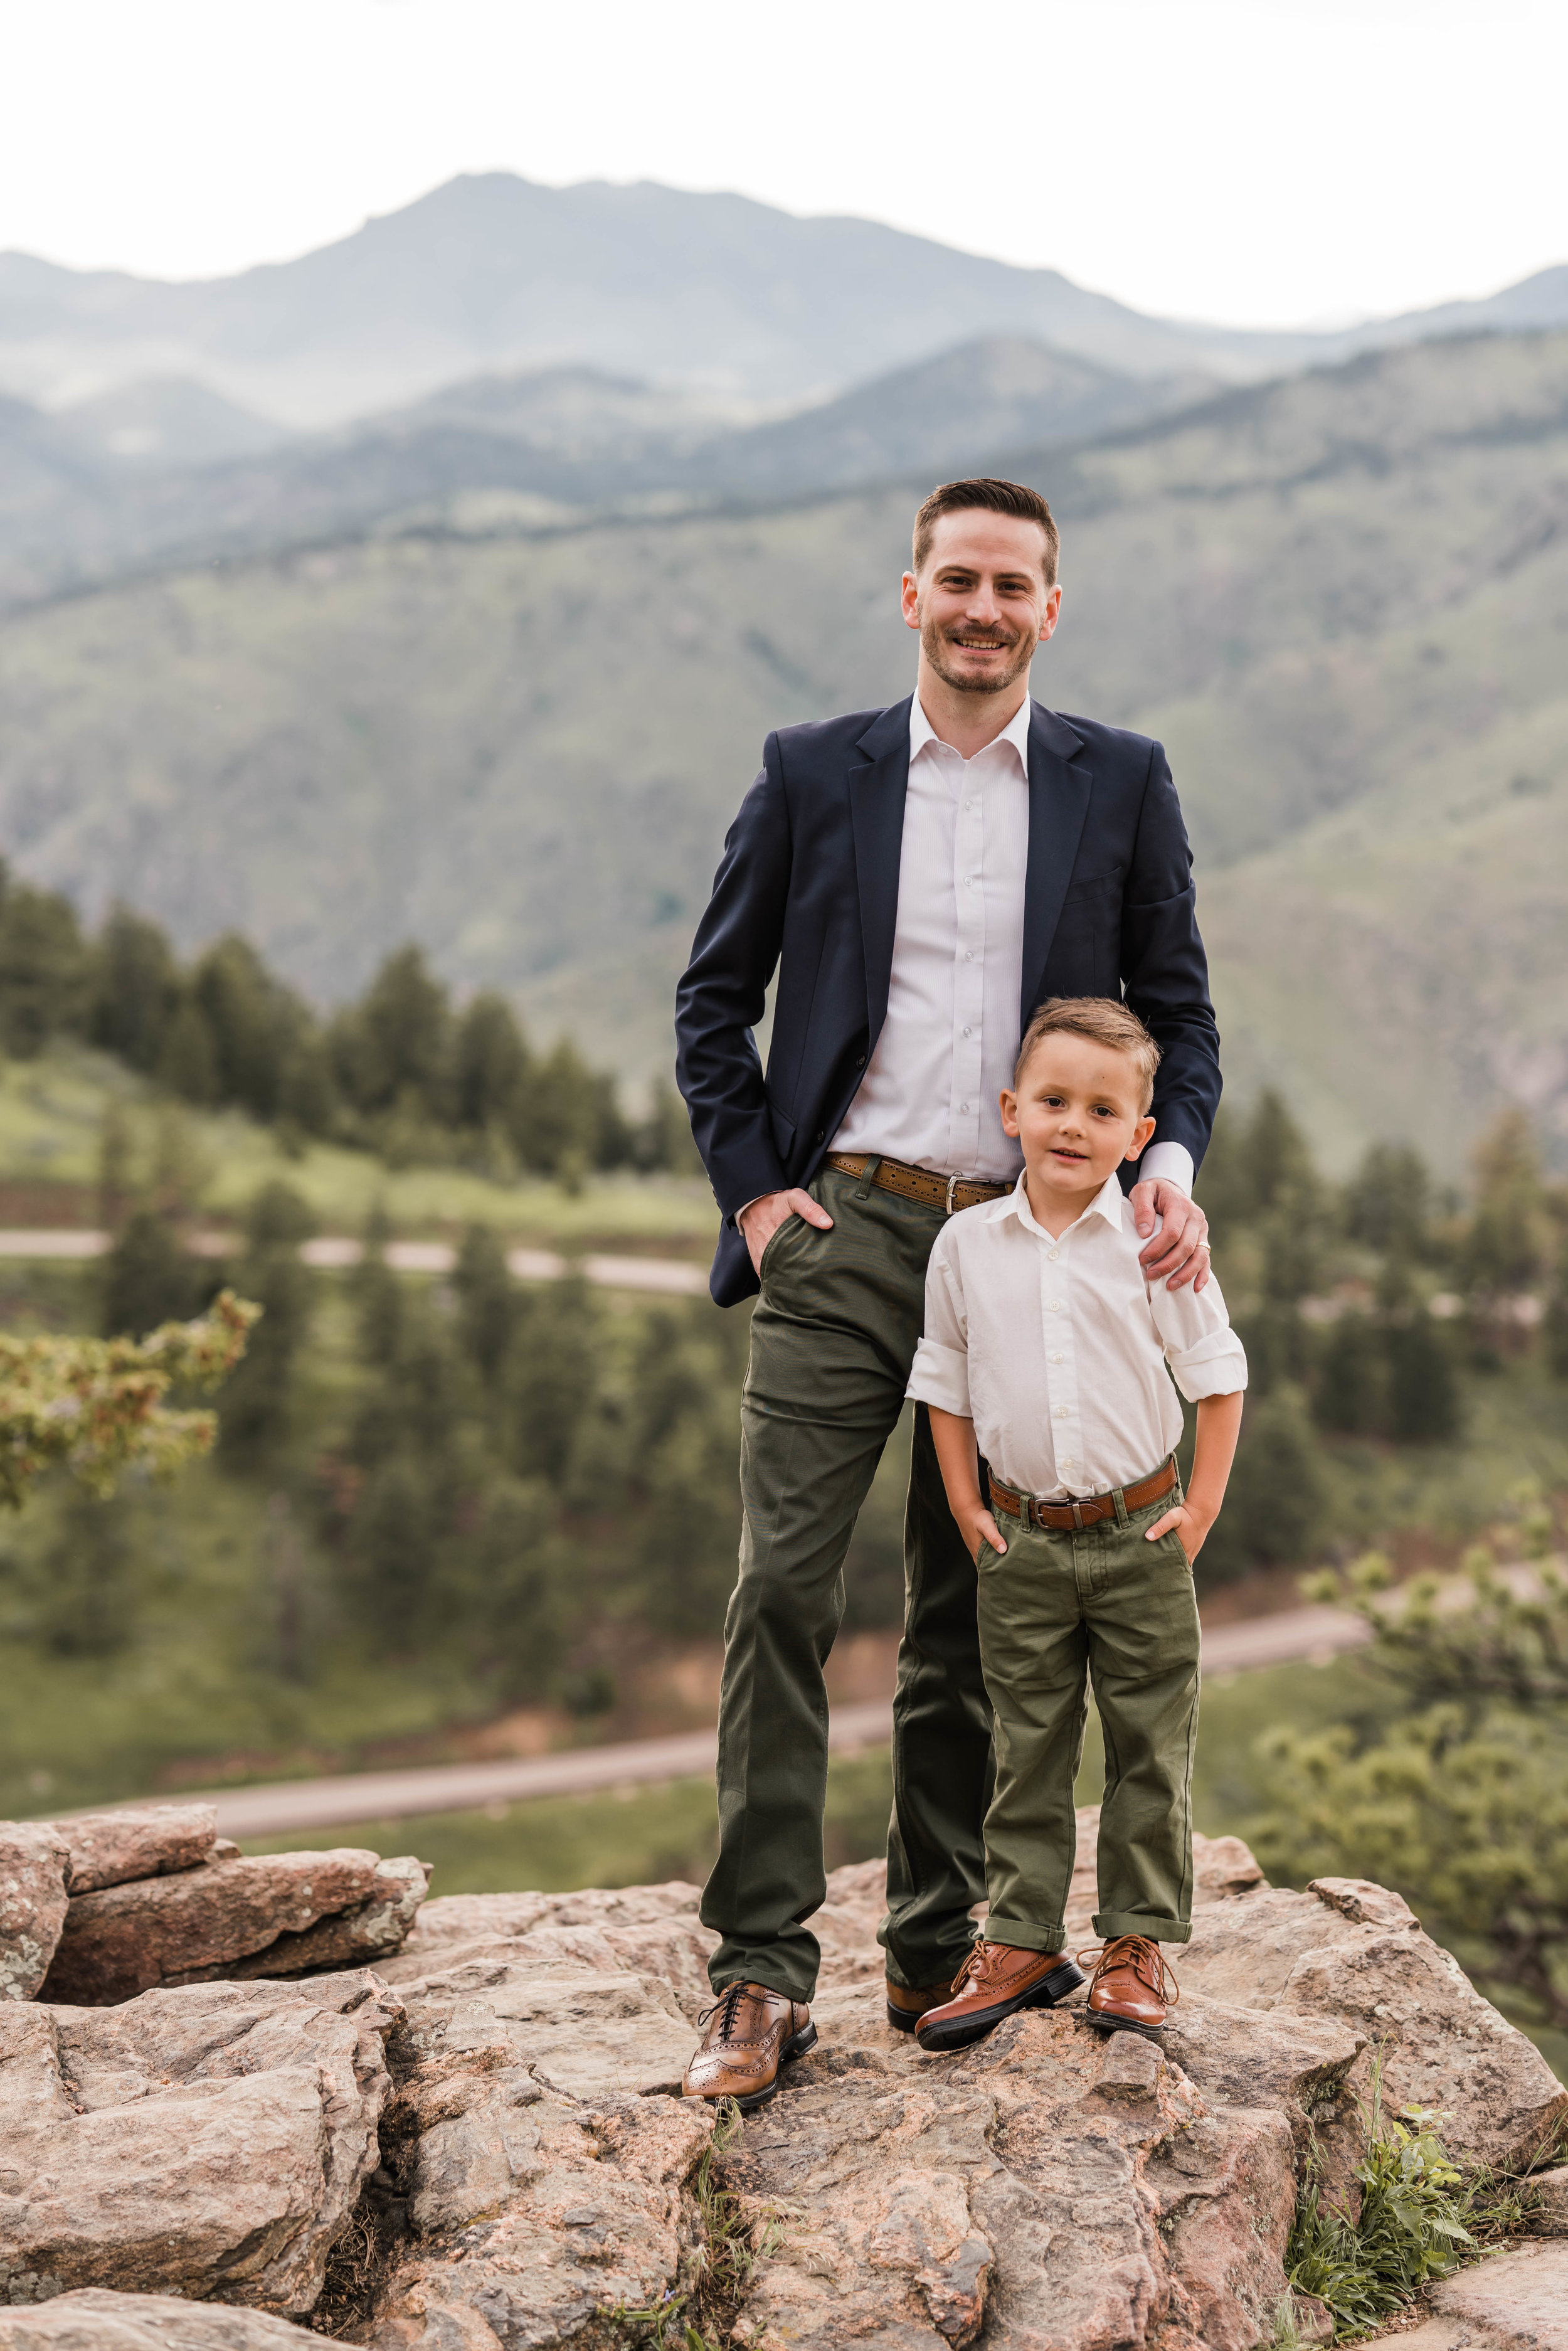 denver family photographer at lookout mountain -DSC07088.jpg